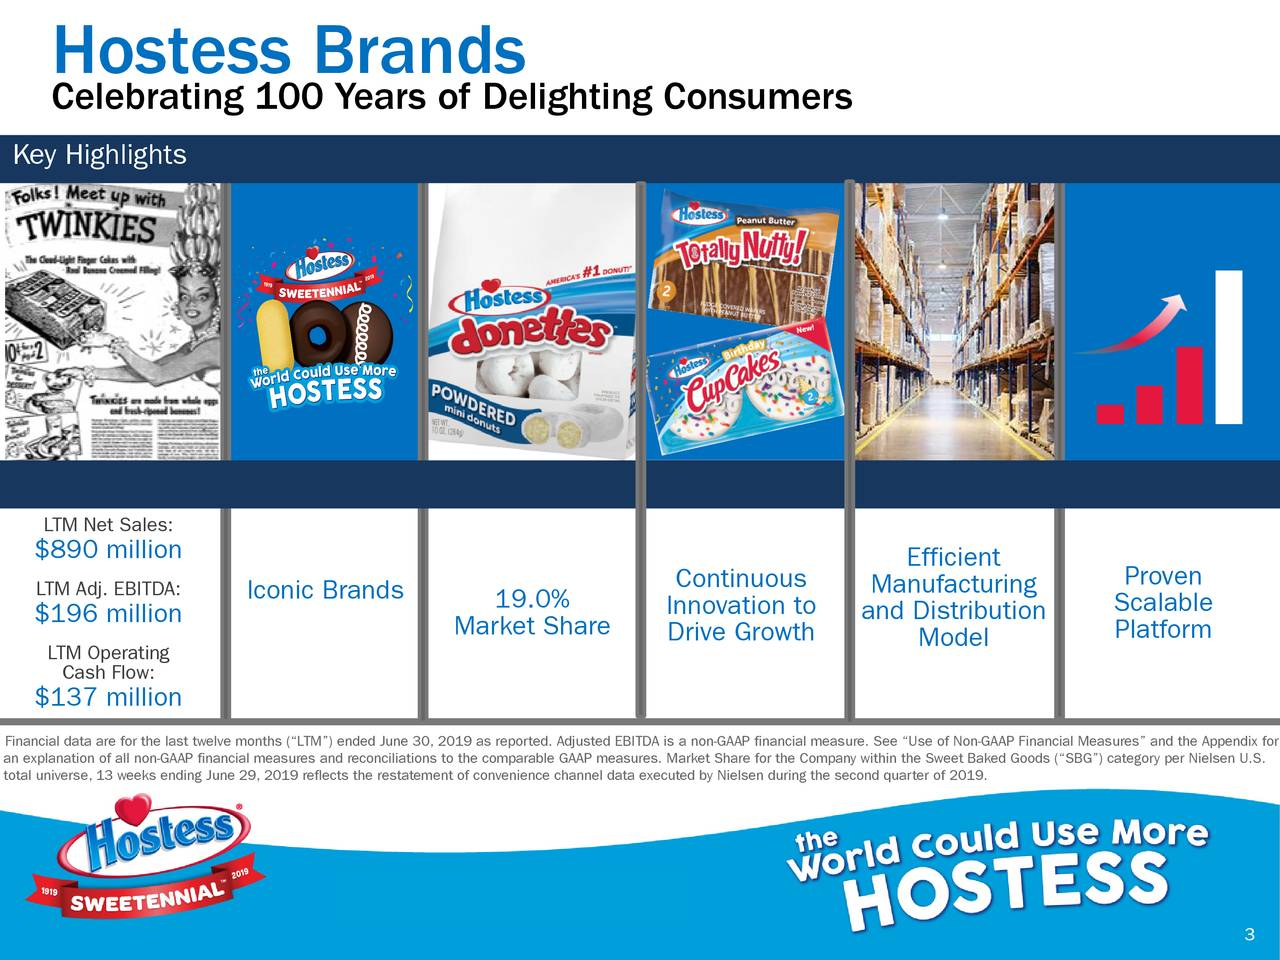 Hostess Brands